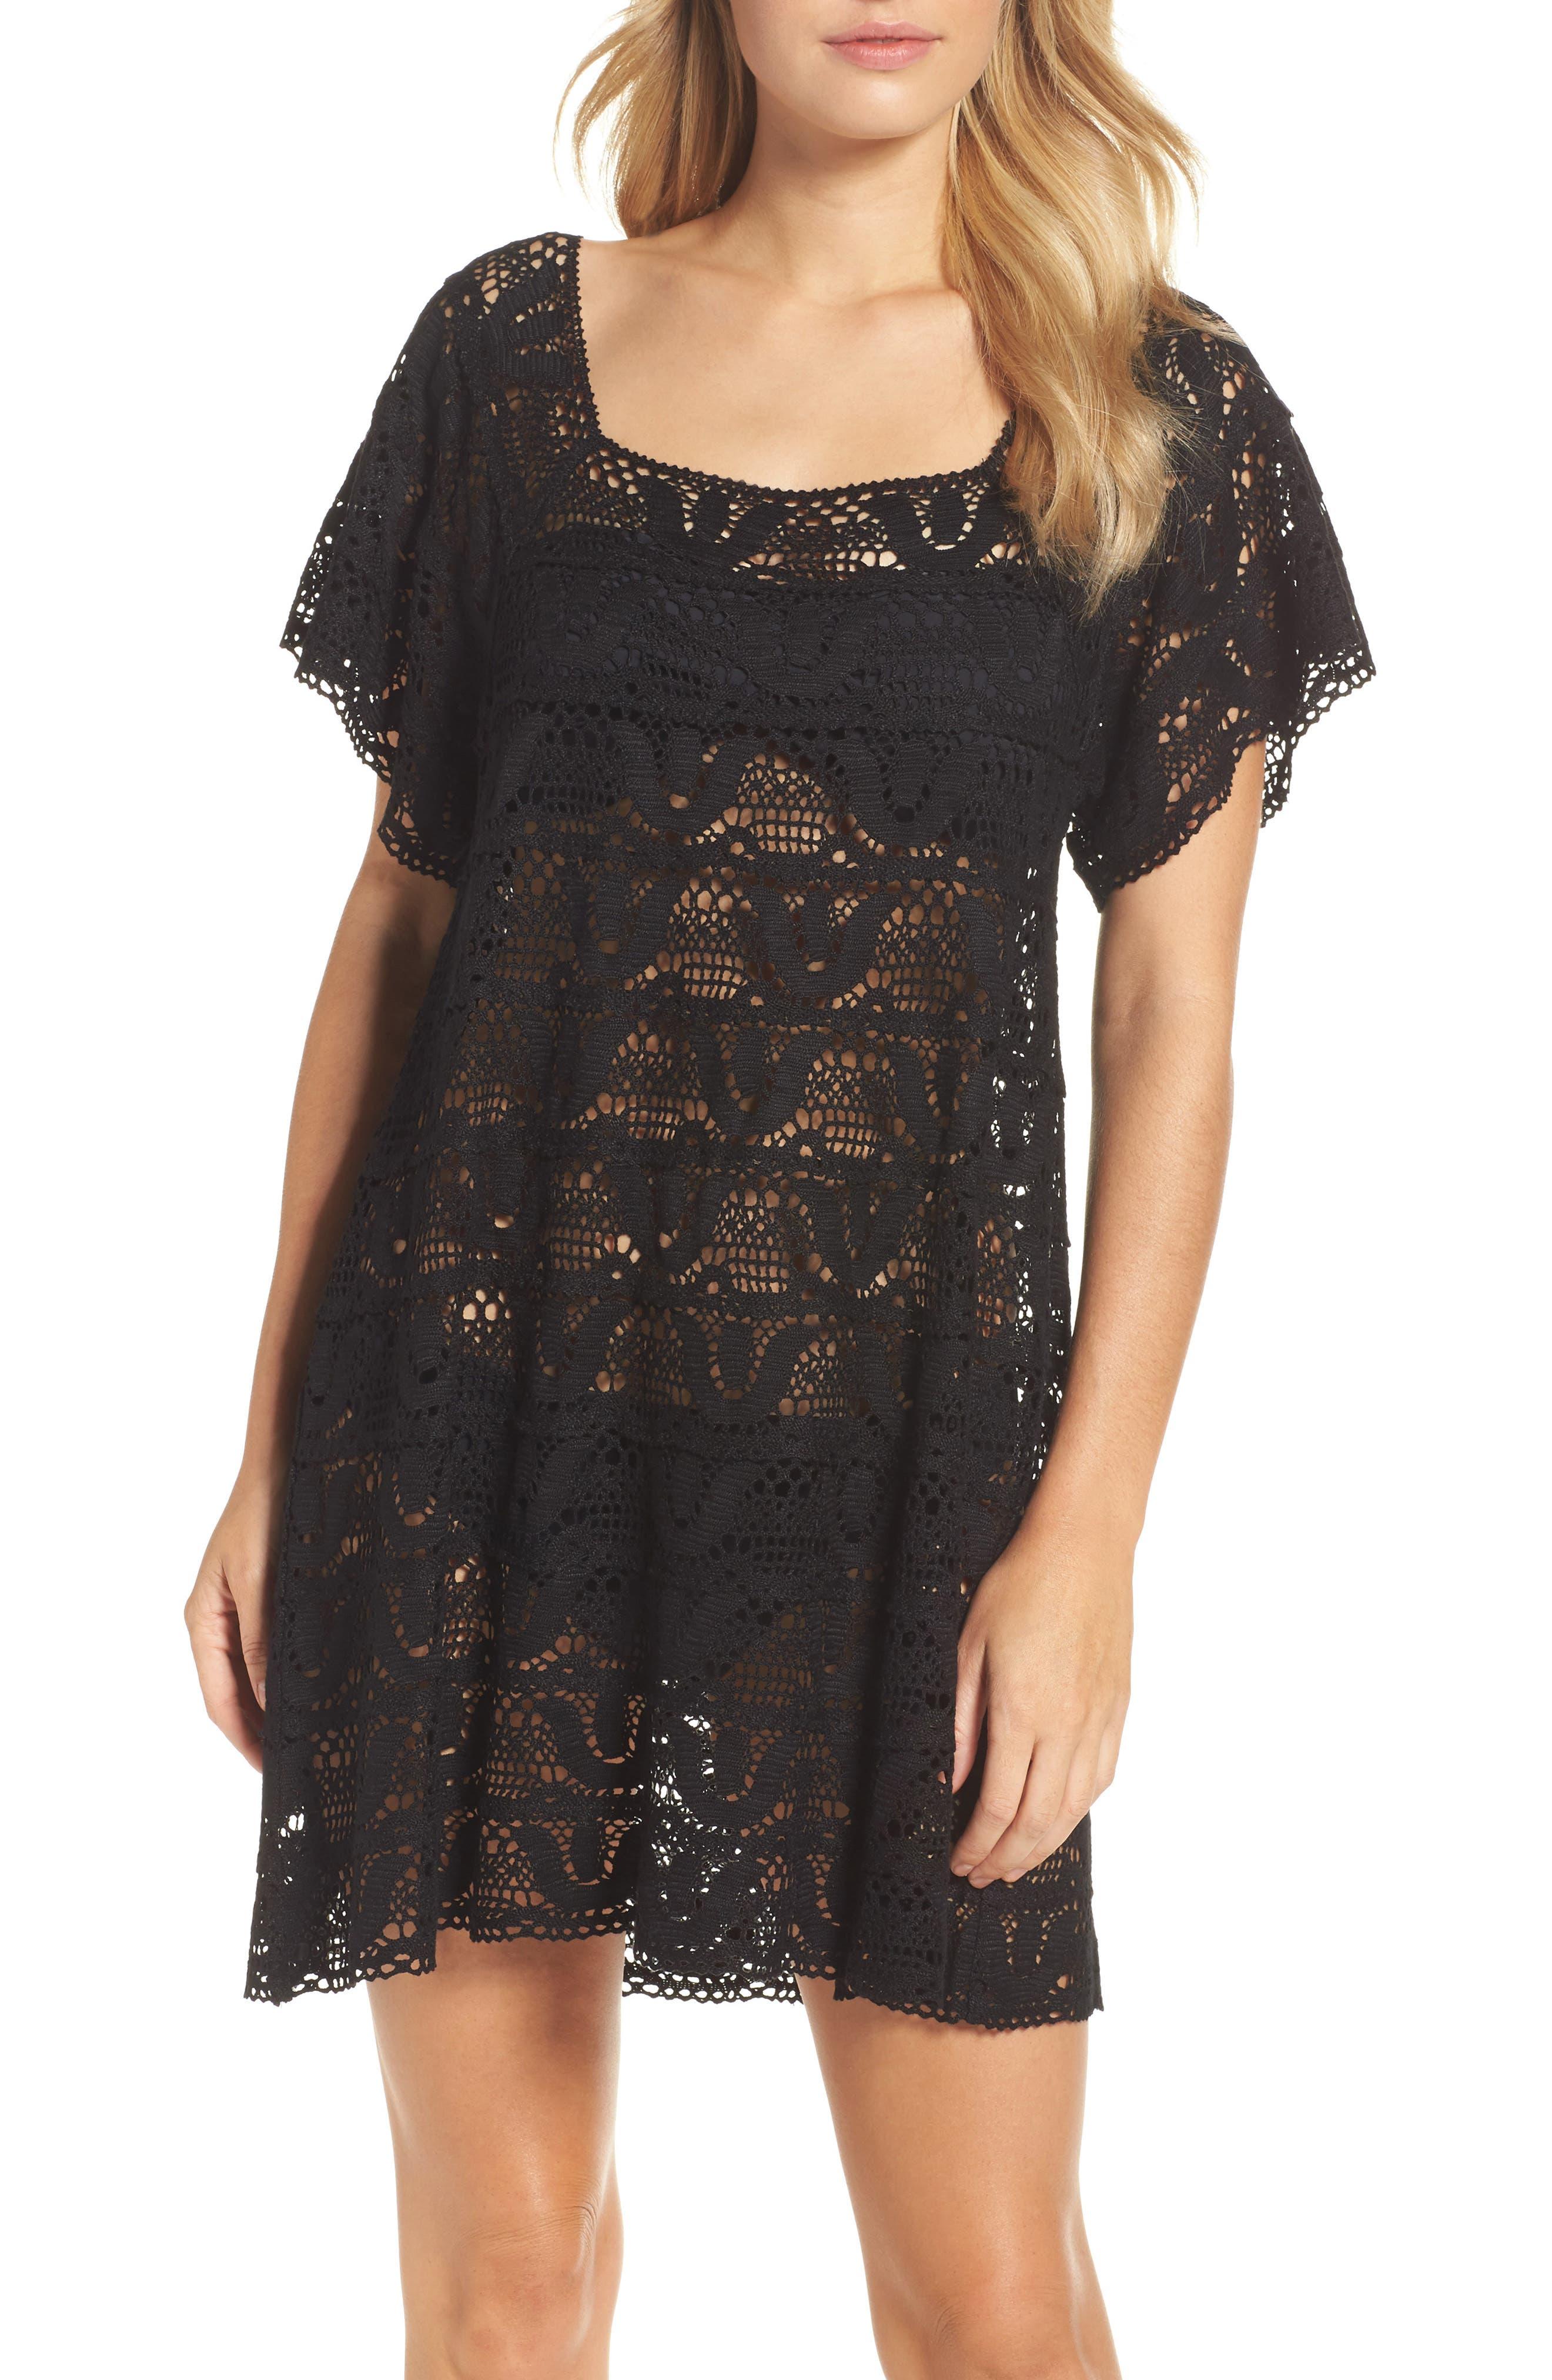 Alternate Image 1 Selected - Nanette Lapore Crochet Cover-Up Dress